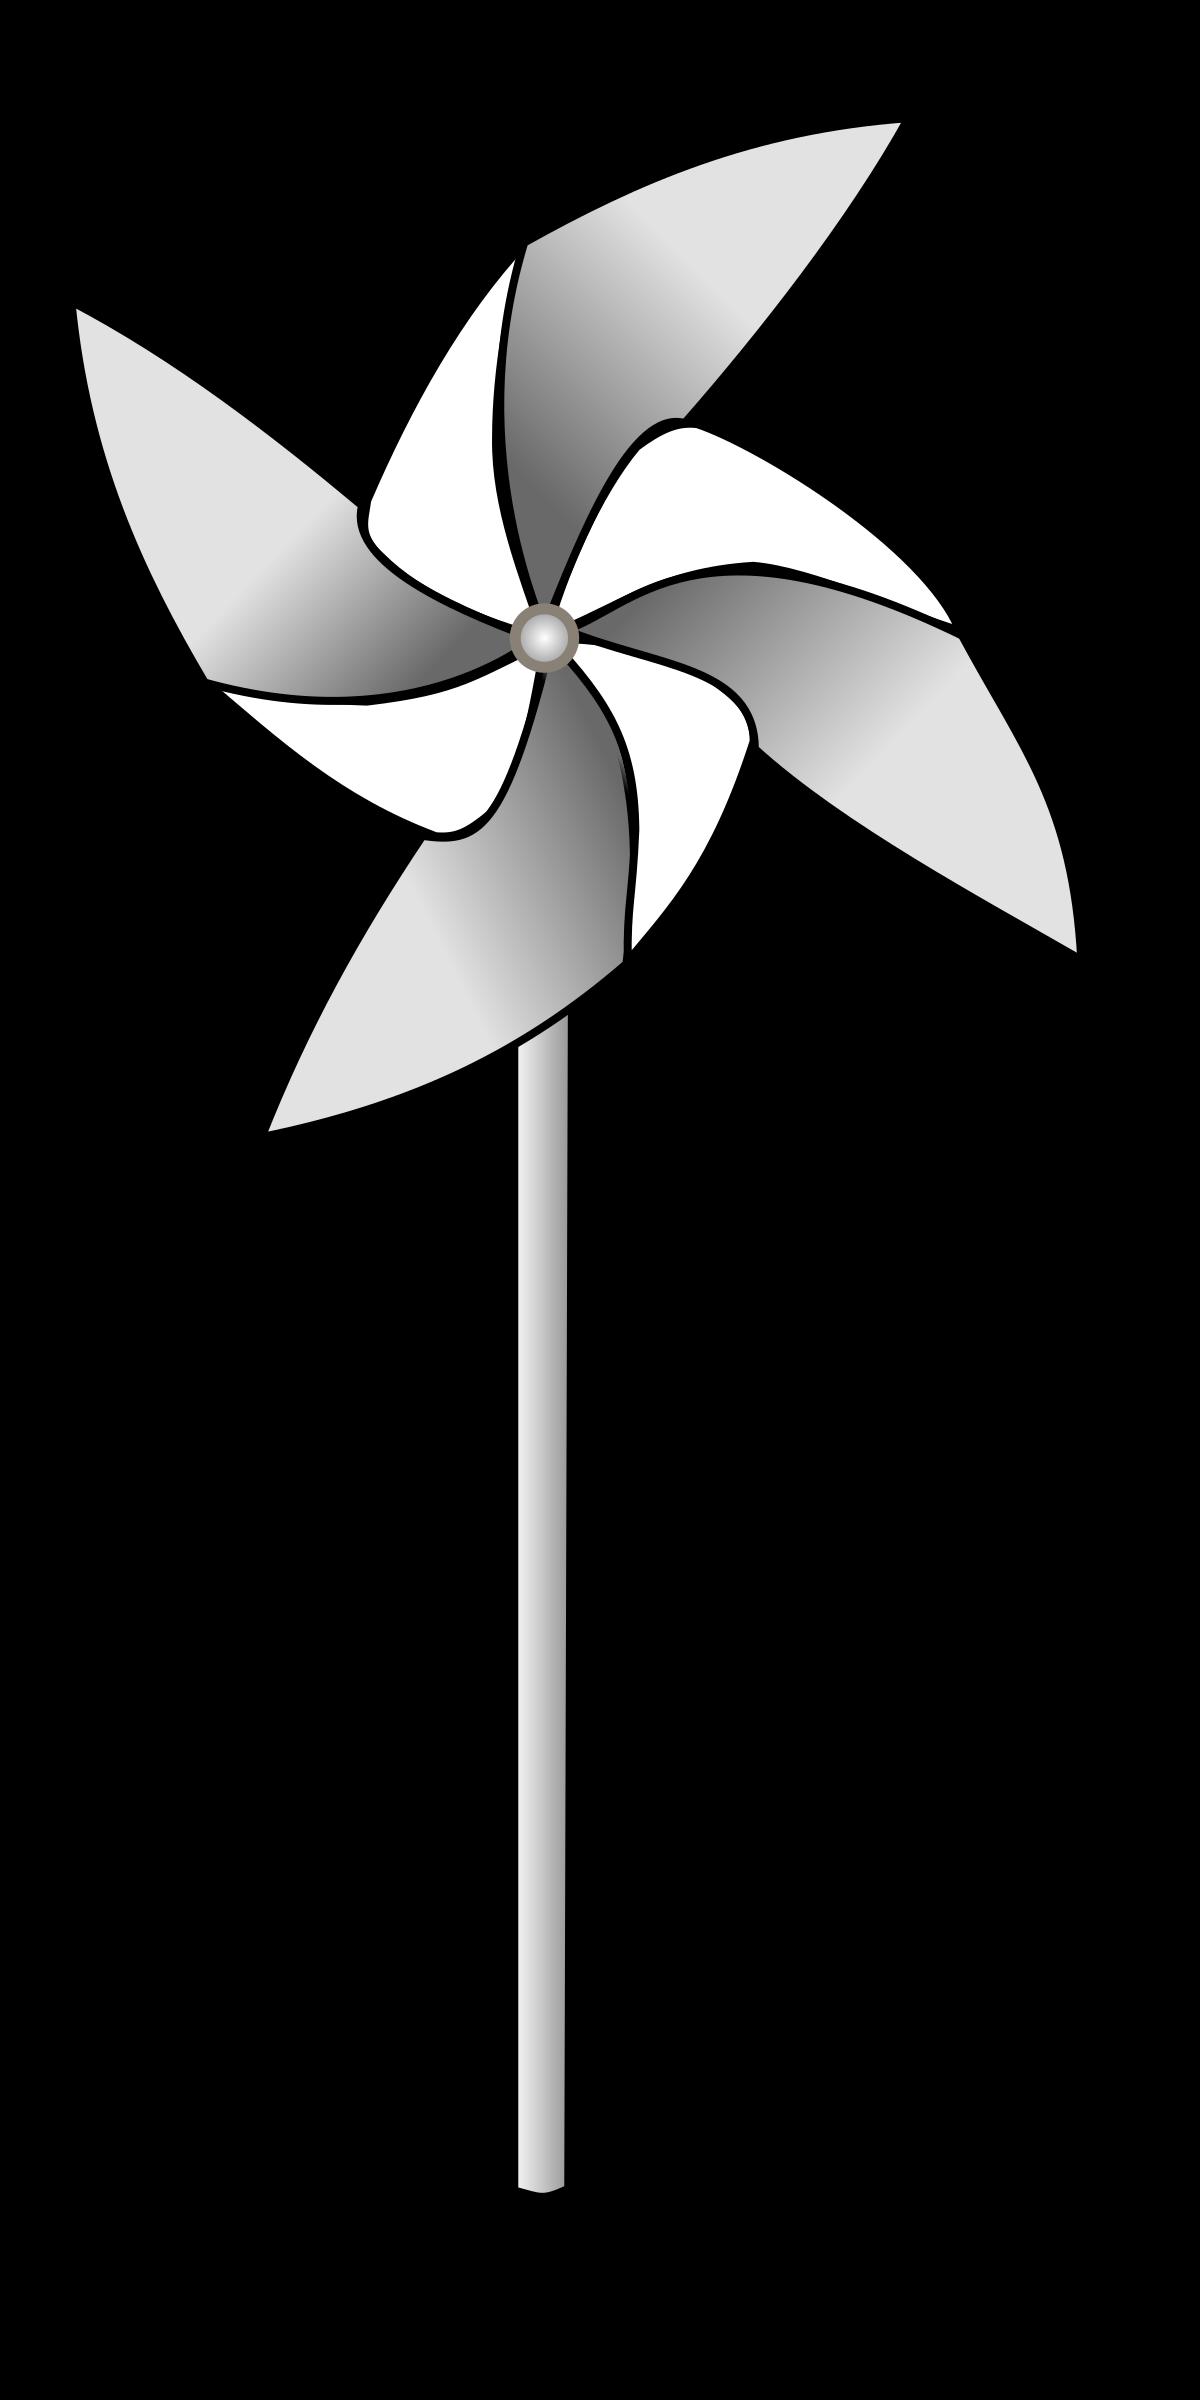 Pinwheel. Wheel clipart windmill